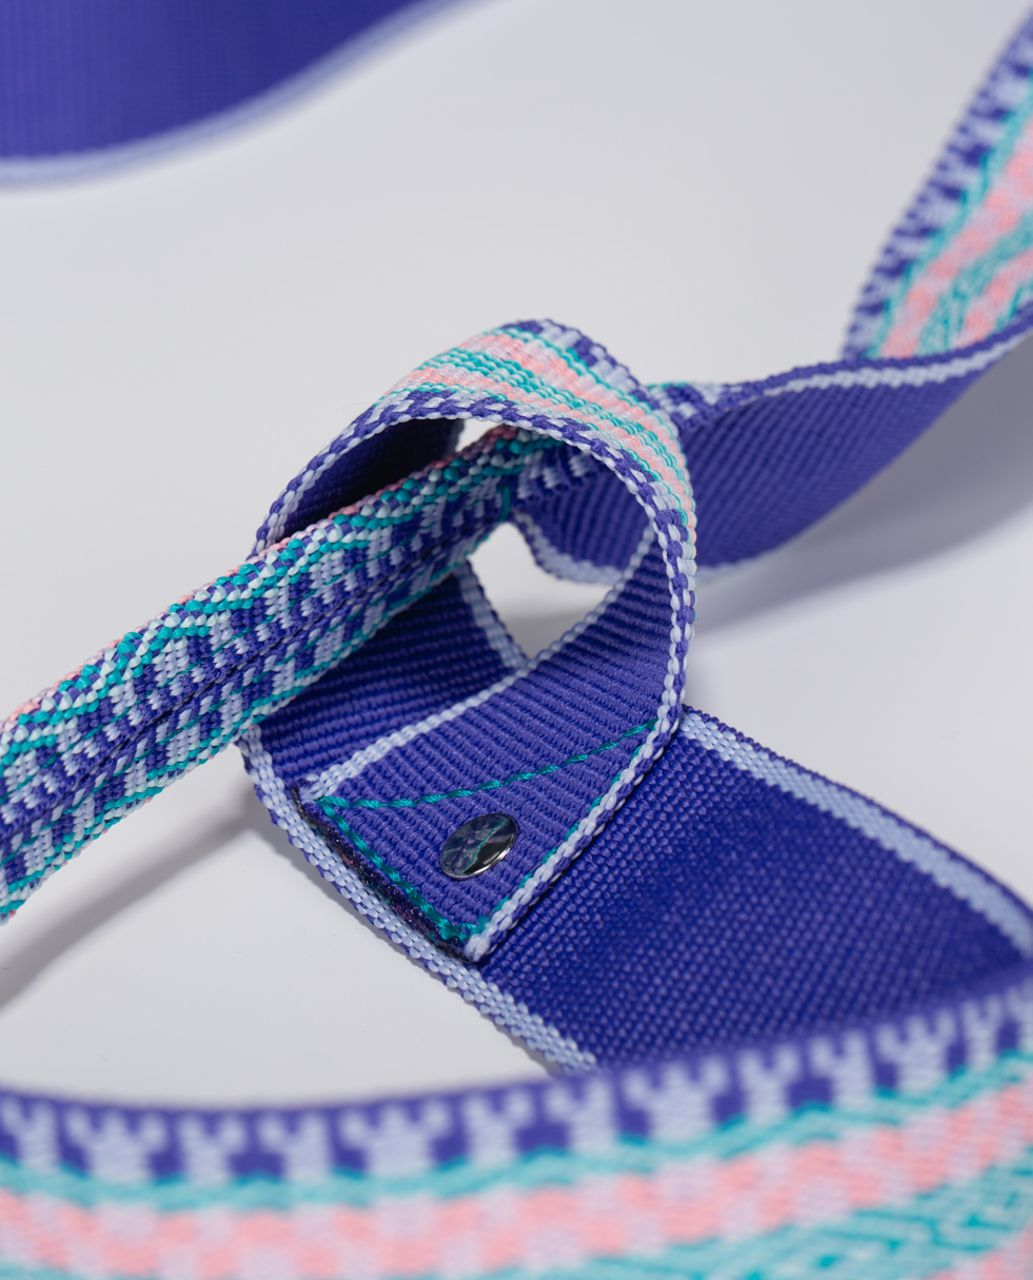 Lululemon Loop It Up Mat Strap - Blue Tropics / Aquamarine / Bleached Coral / Barely Pink / Cool Breeze